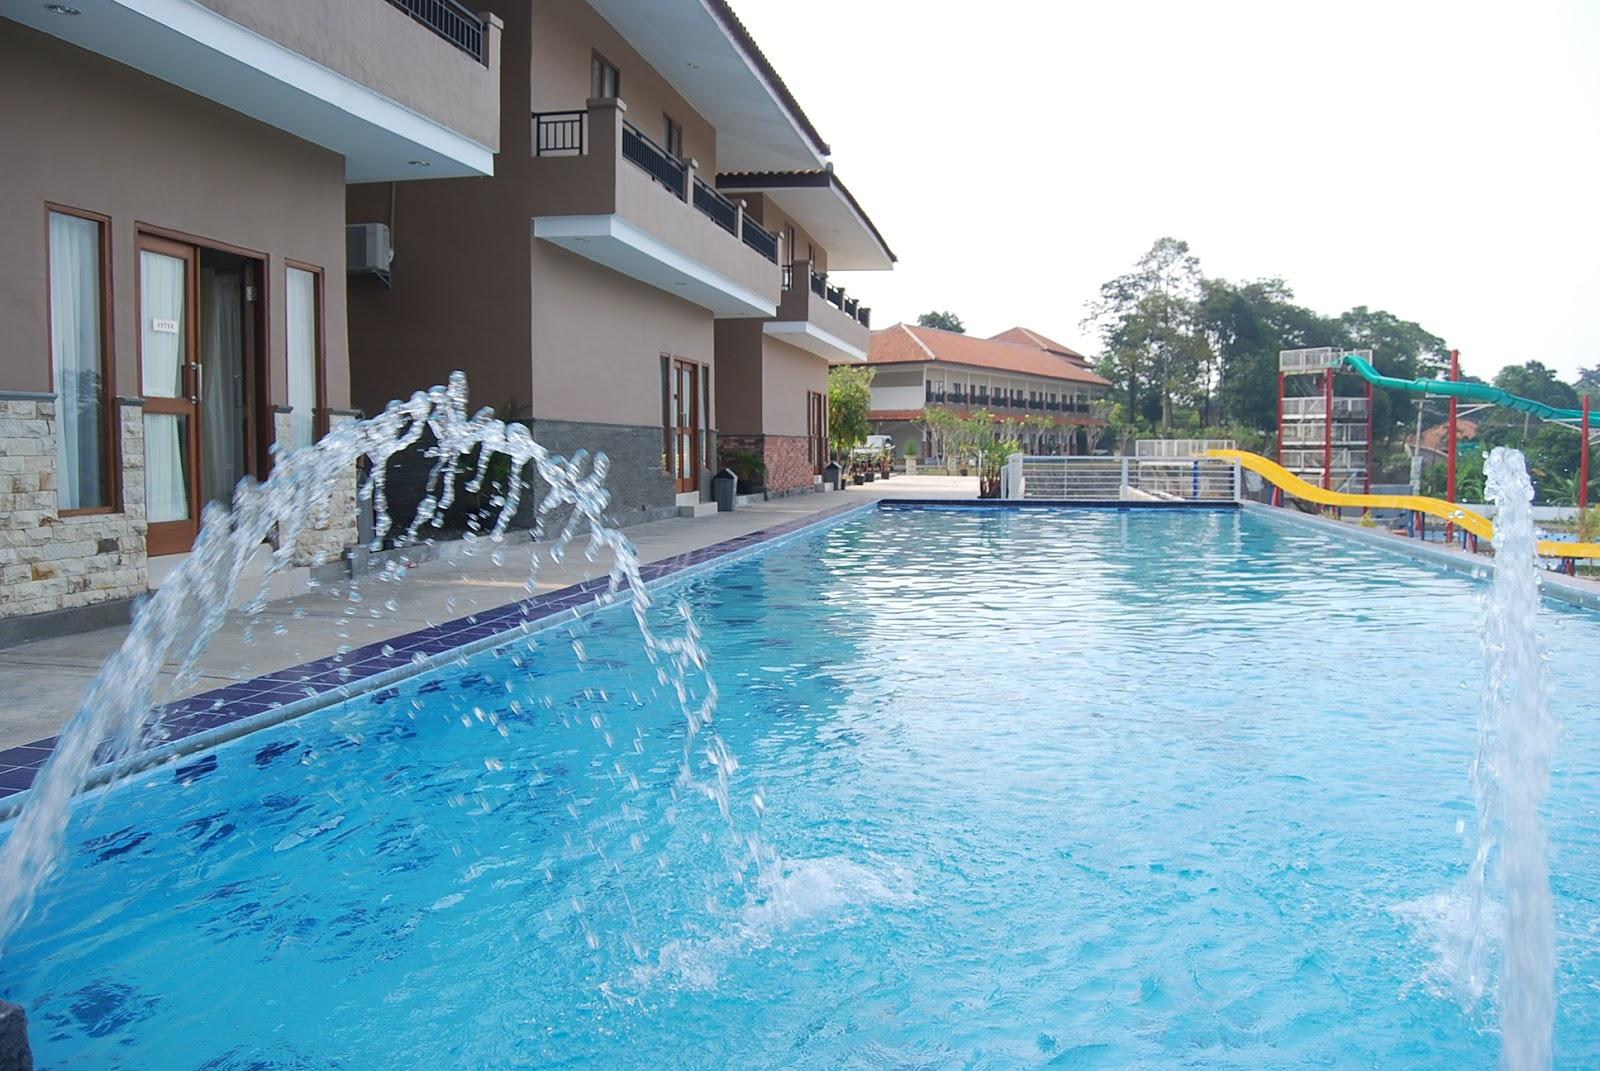 Bukit Gumati Batutulis Mulai Beroperasi Pada Tahun 2008 Terletak Di Jl Drs R Saleh Danasasmita No 165 Bogor Yang Berkembang Menjadi Hotel